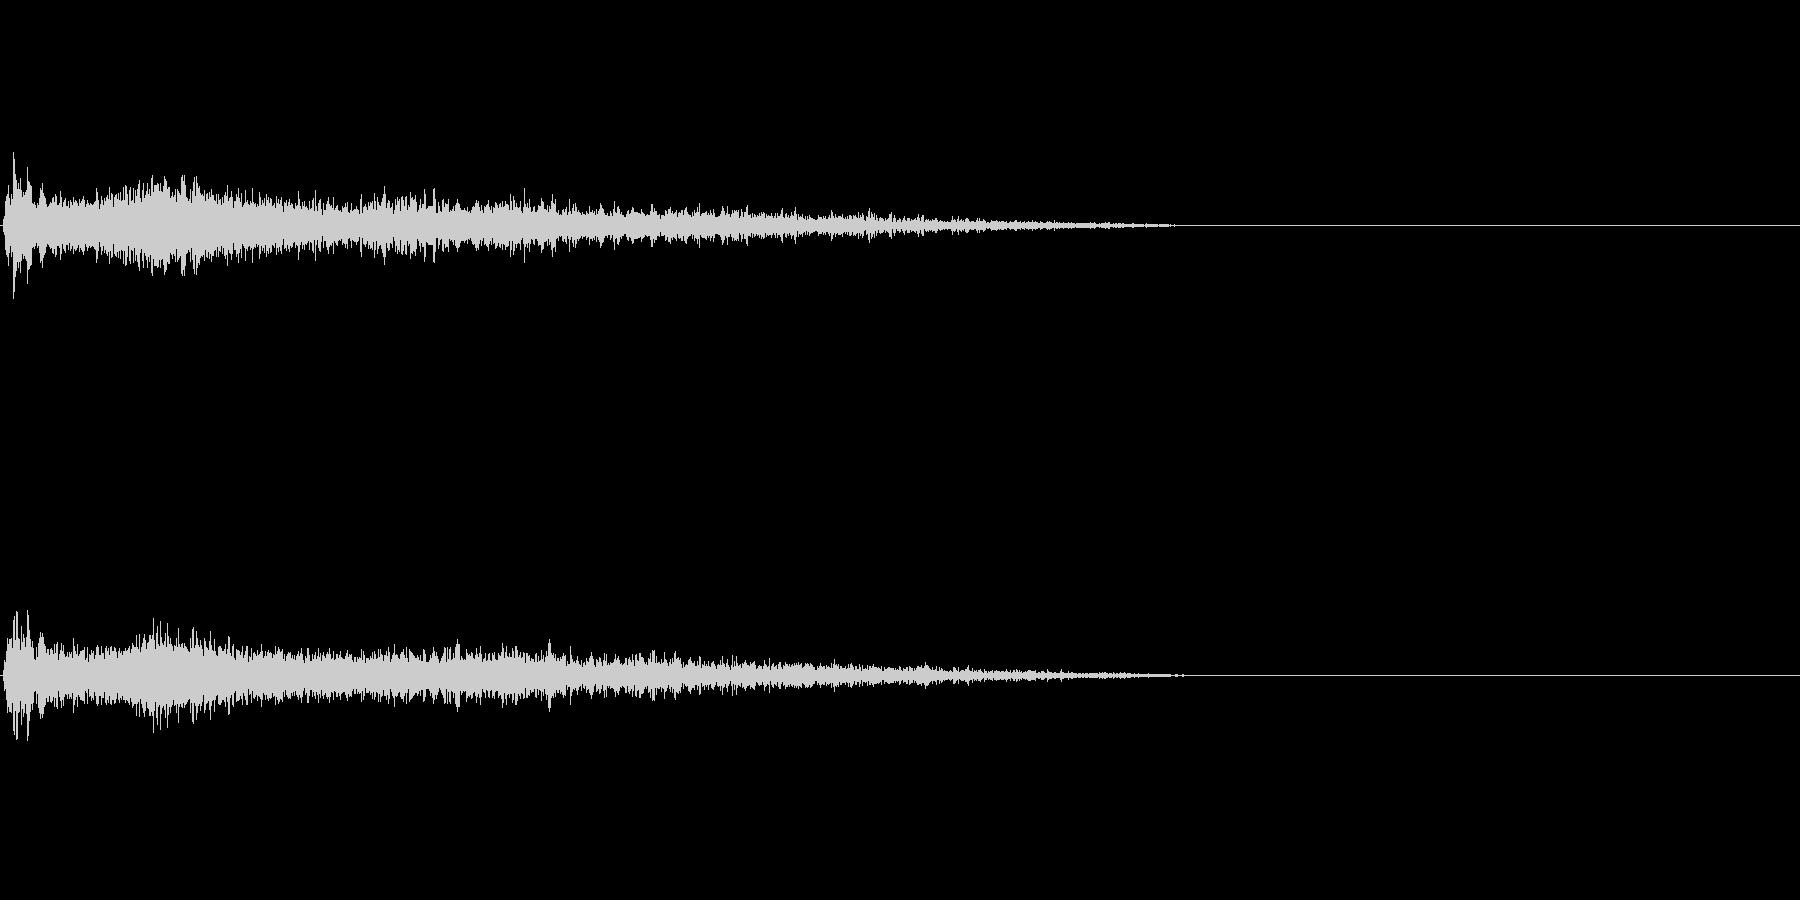 Fメジャー インパクト音 衝撃音の未再生の波形